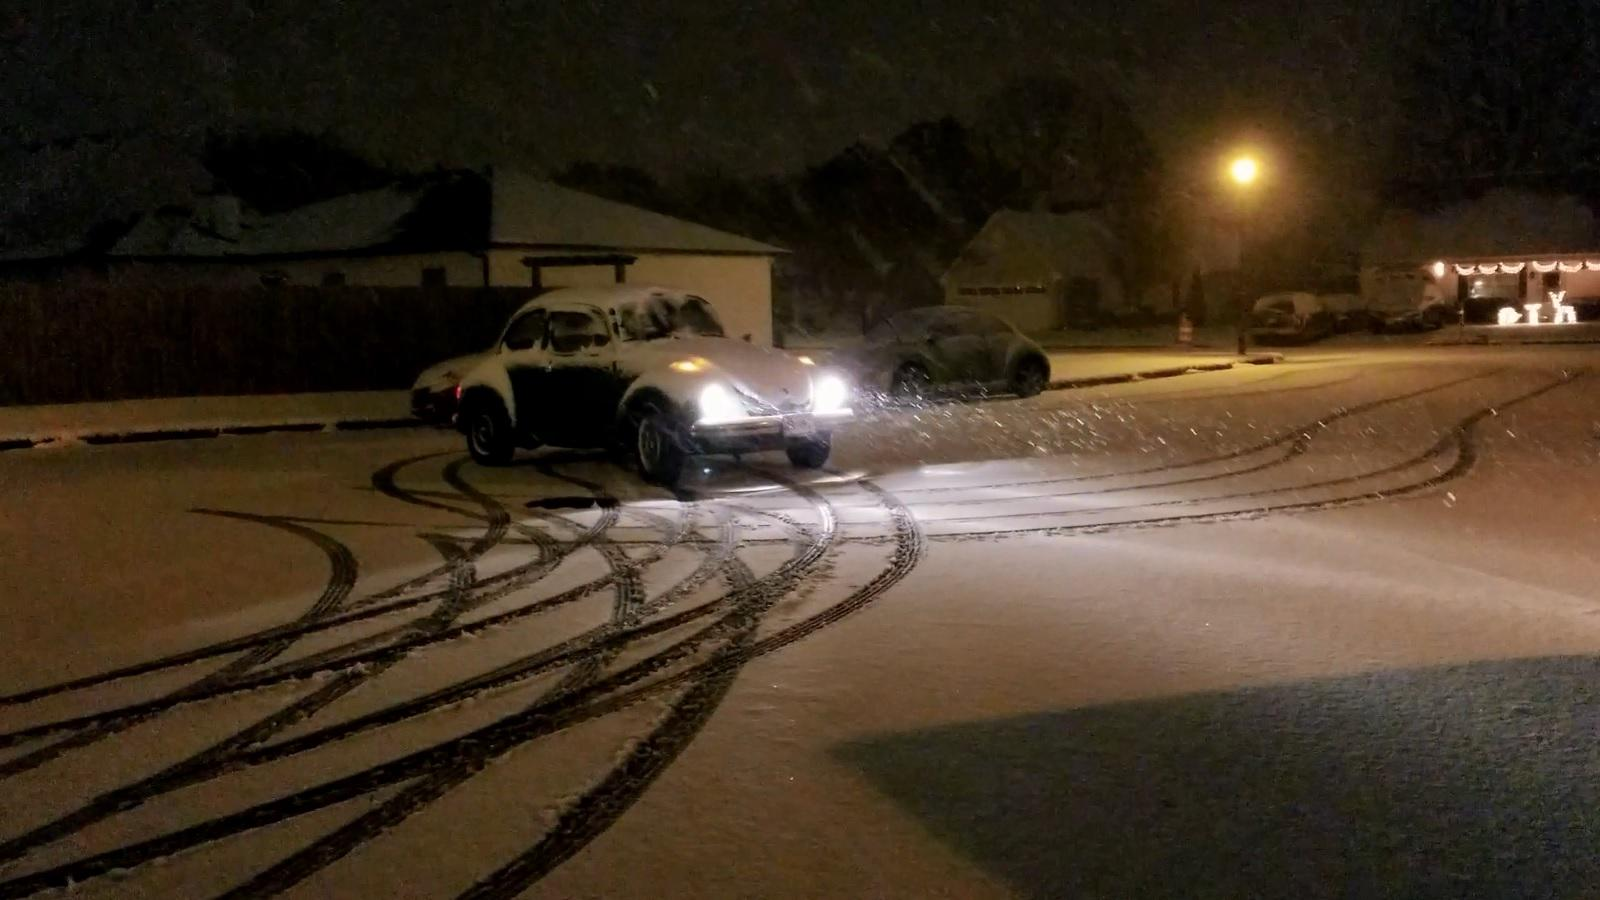 1973 Super Beetle in Snow